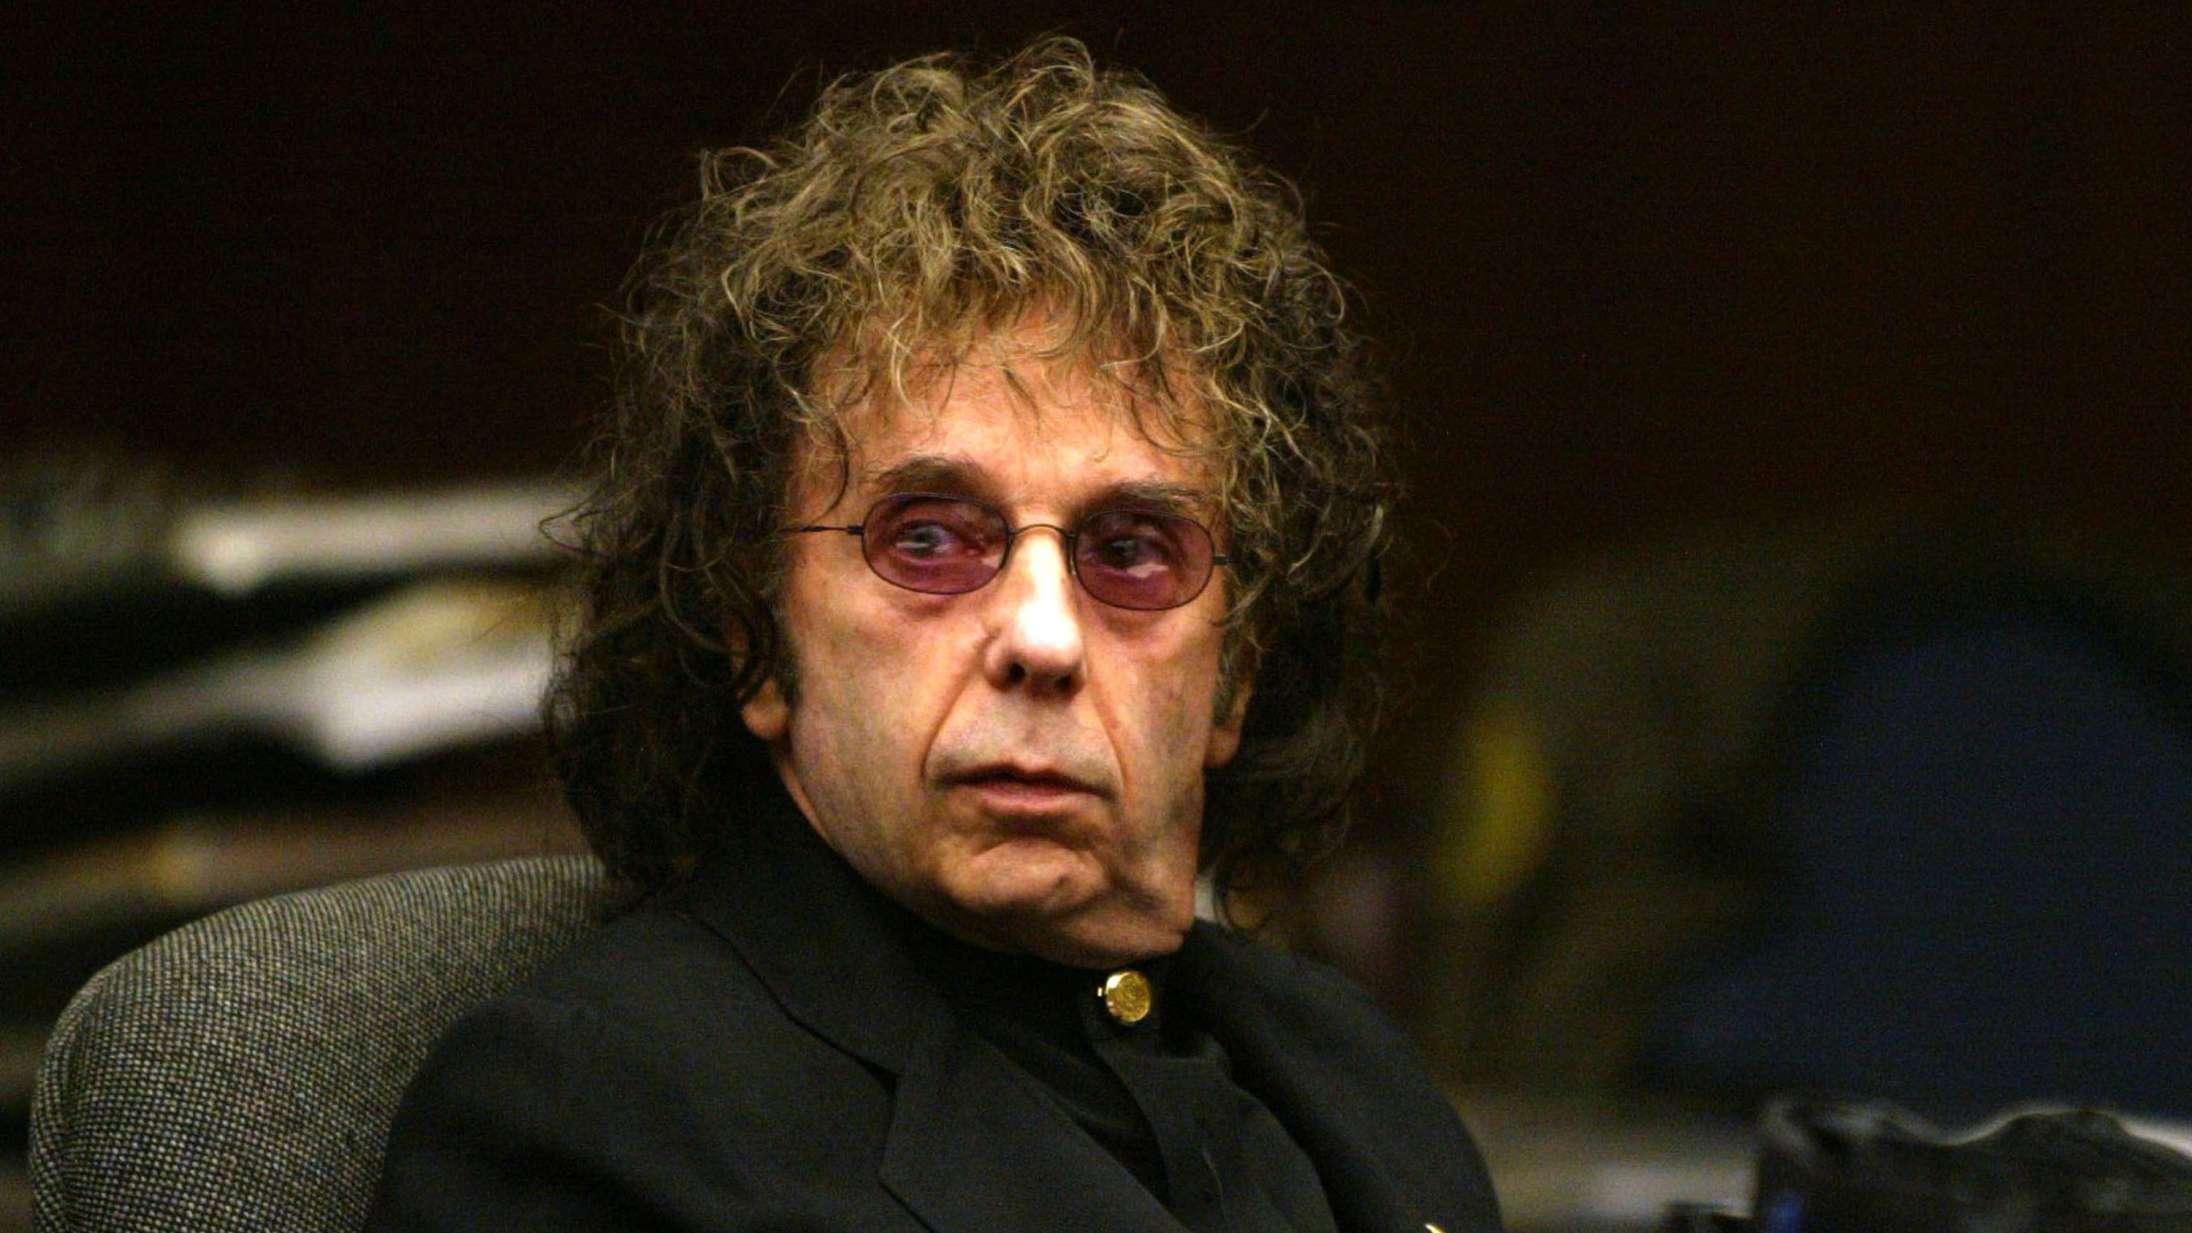 Den drabsdømte stjerneproducer Phil Spector er død